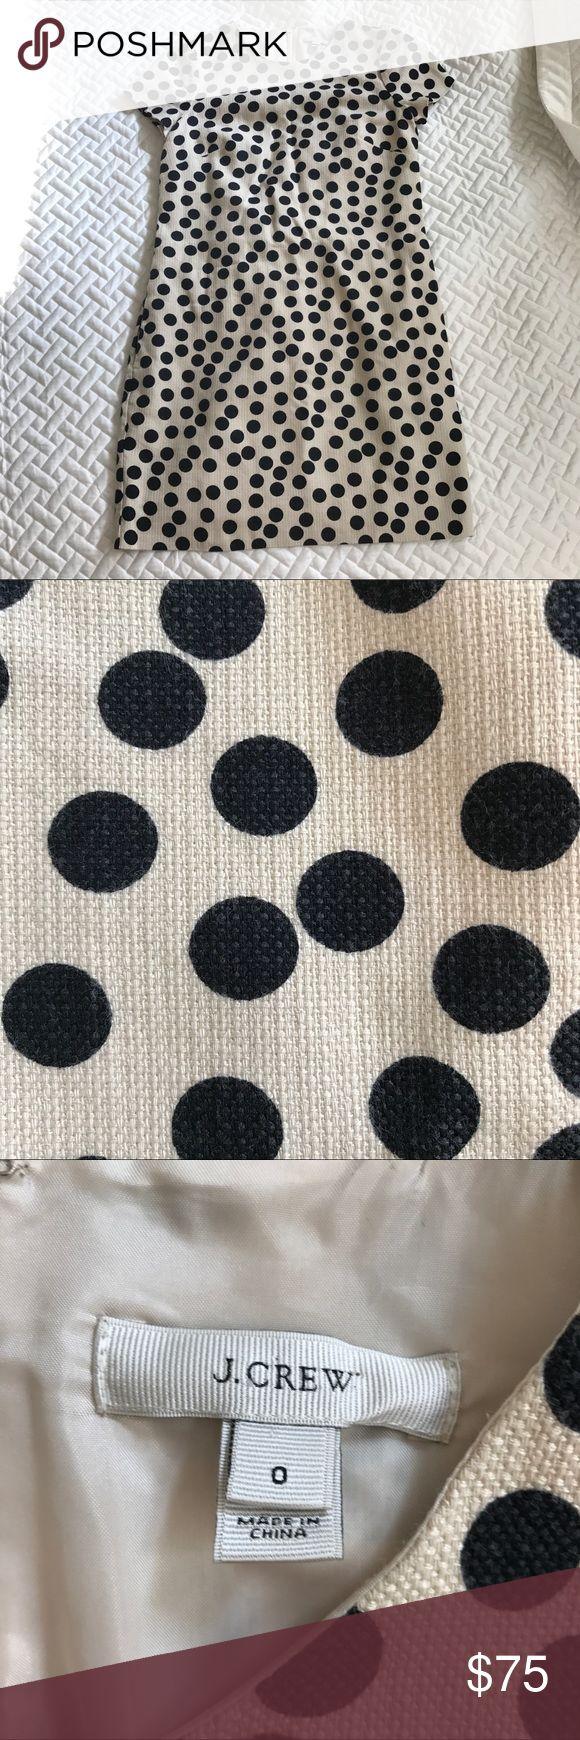 J Crew polka dot dress, size 0 J Crew tan short sleeve dress with black polka dots size 0 J. Crew Dresses